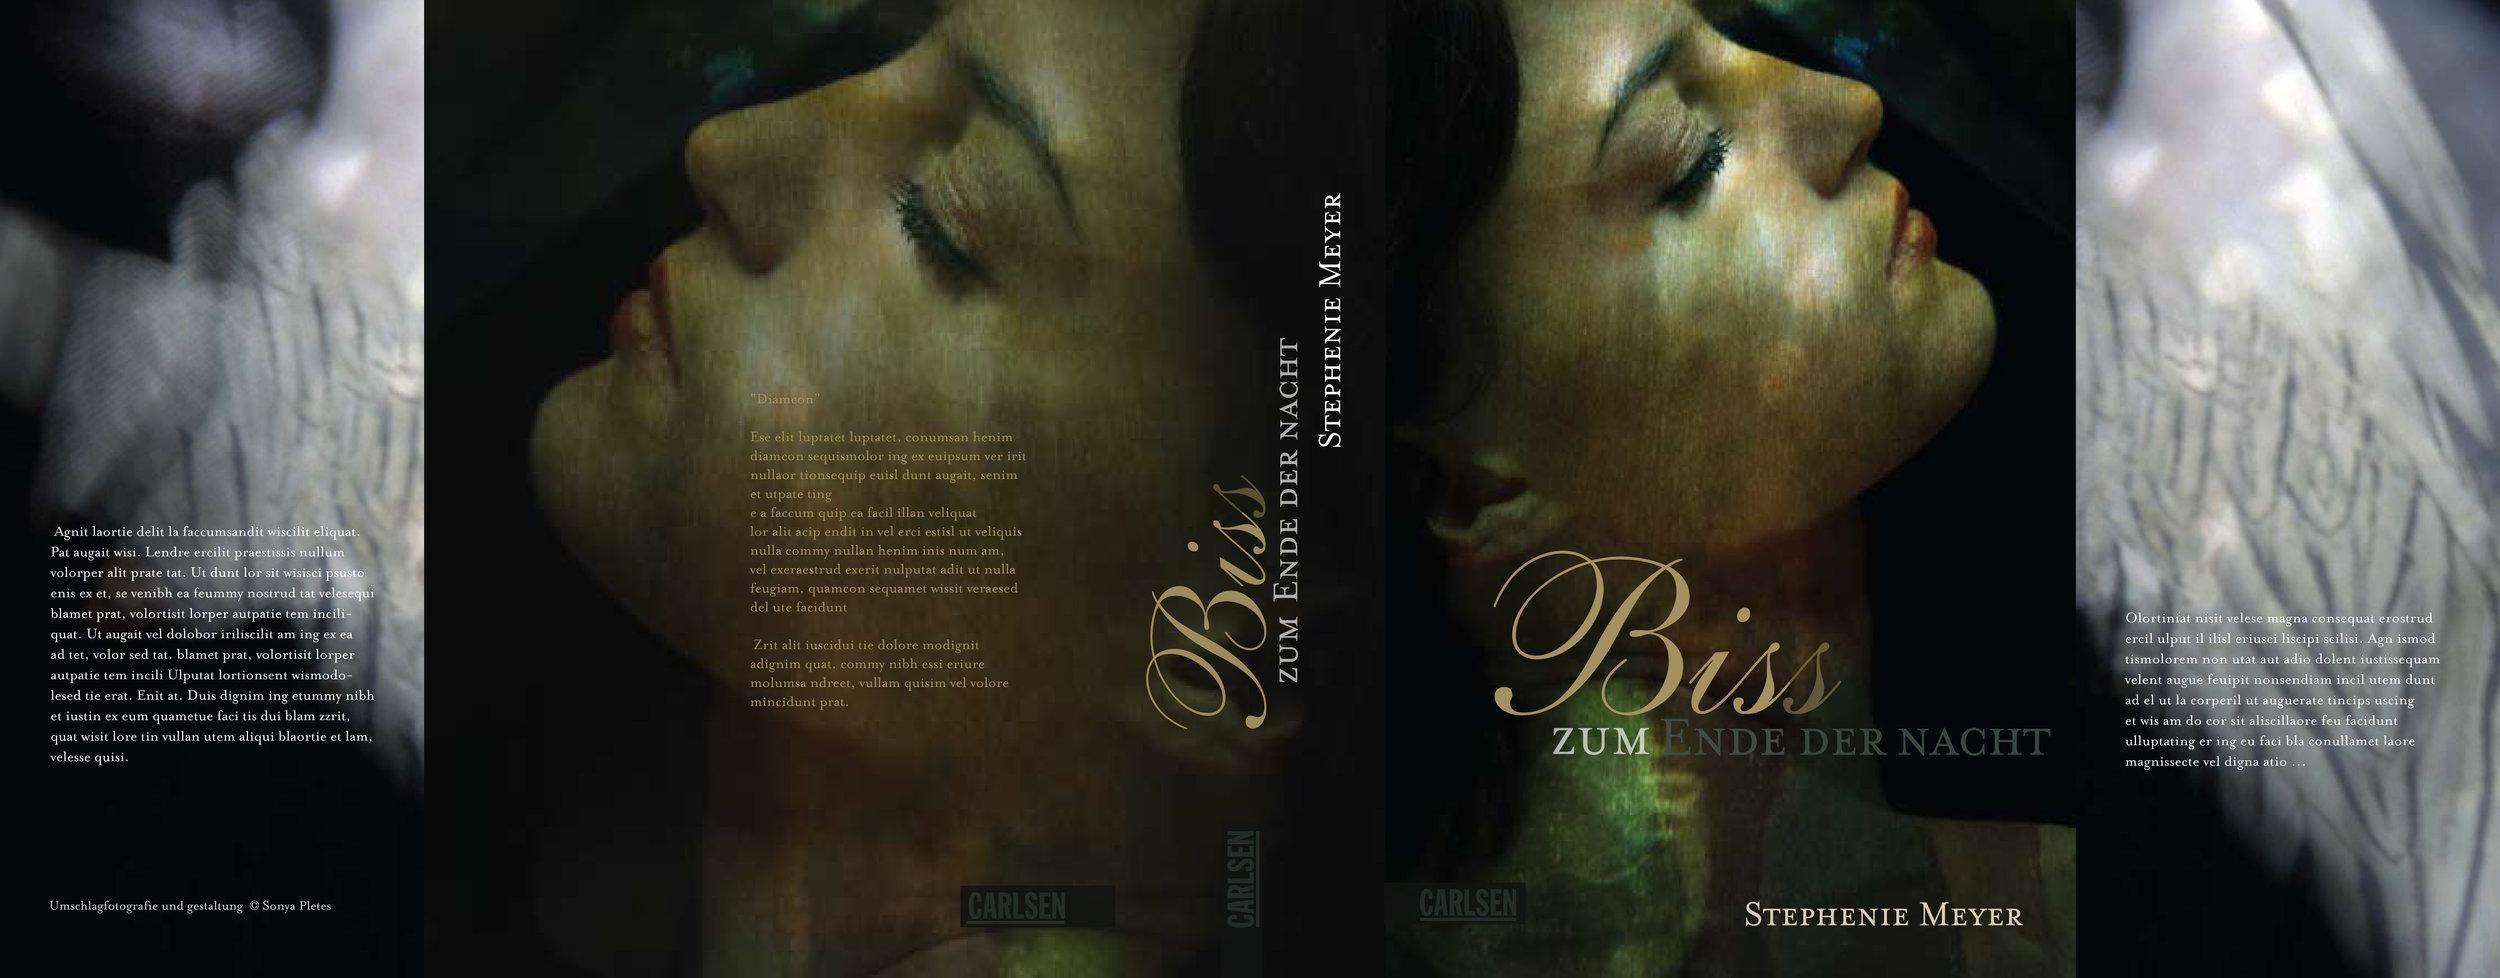 'Breaking Dawn'   by Stephenie Meyer. German Language Edition, Carlsen Verlag, Hamburg.  Design, Photography & Creative Direction © Sonya Pletes